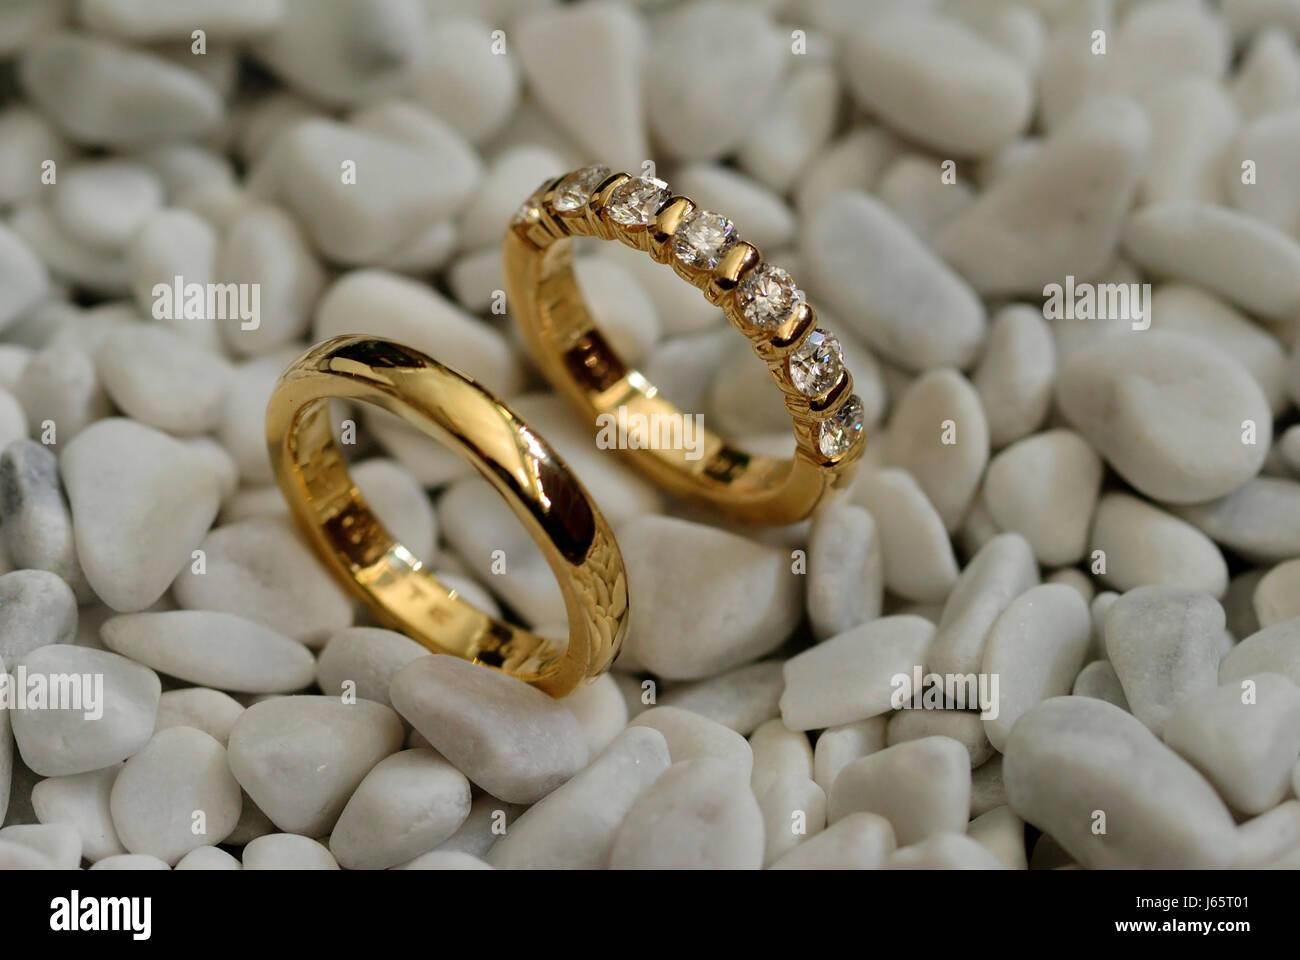 Ring Rings Wedding Rings Couple Pair Marriage Life Partnership Stone